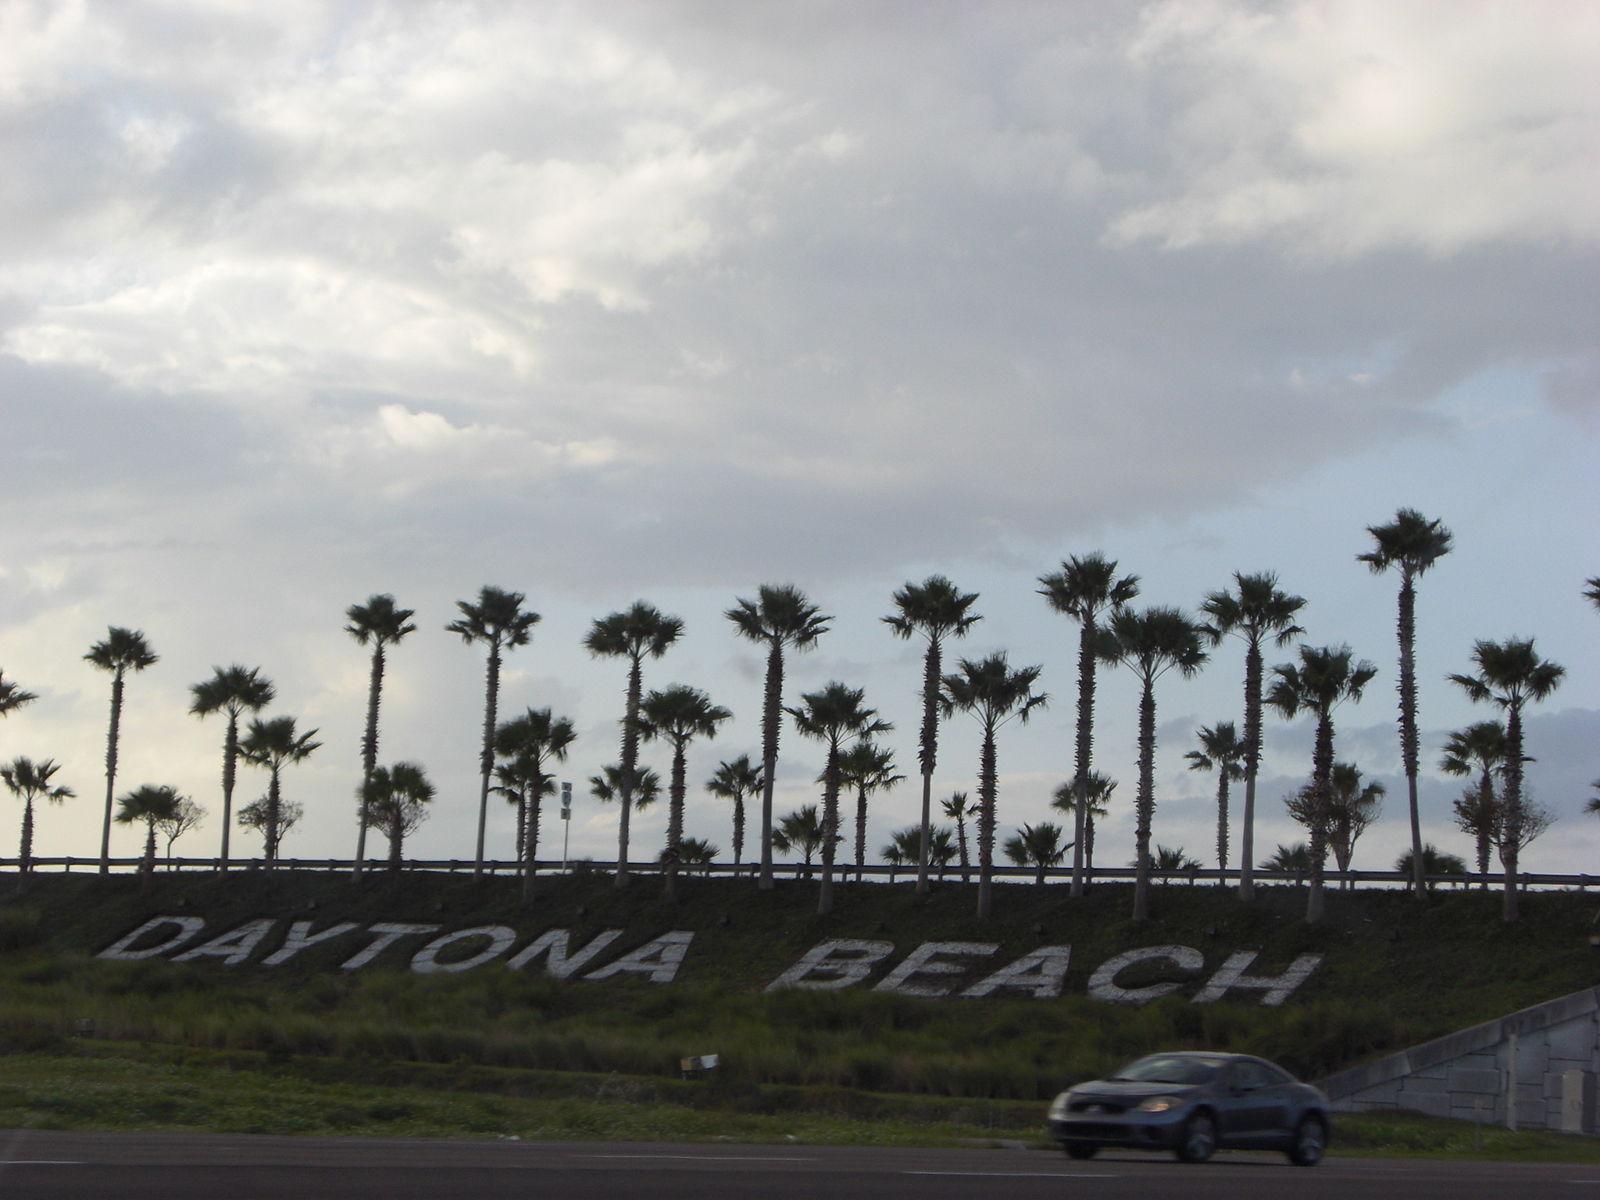 Sites Denison (United States, Texas) Speed Dating In North Miami Beach (United States, Florida).